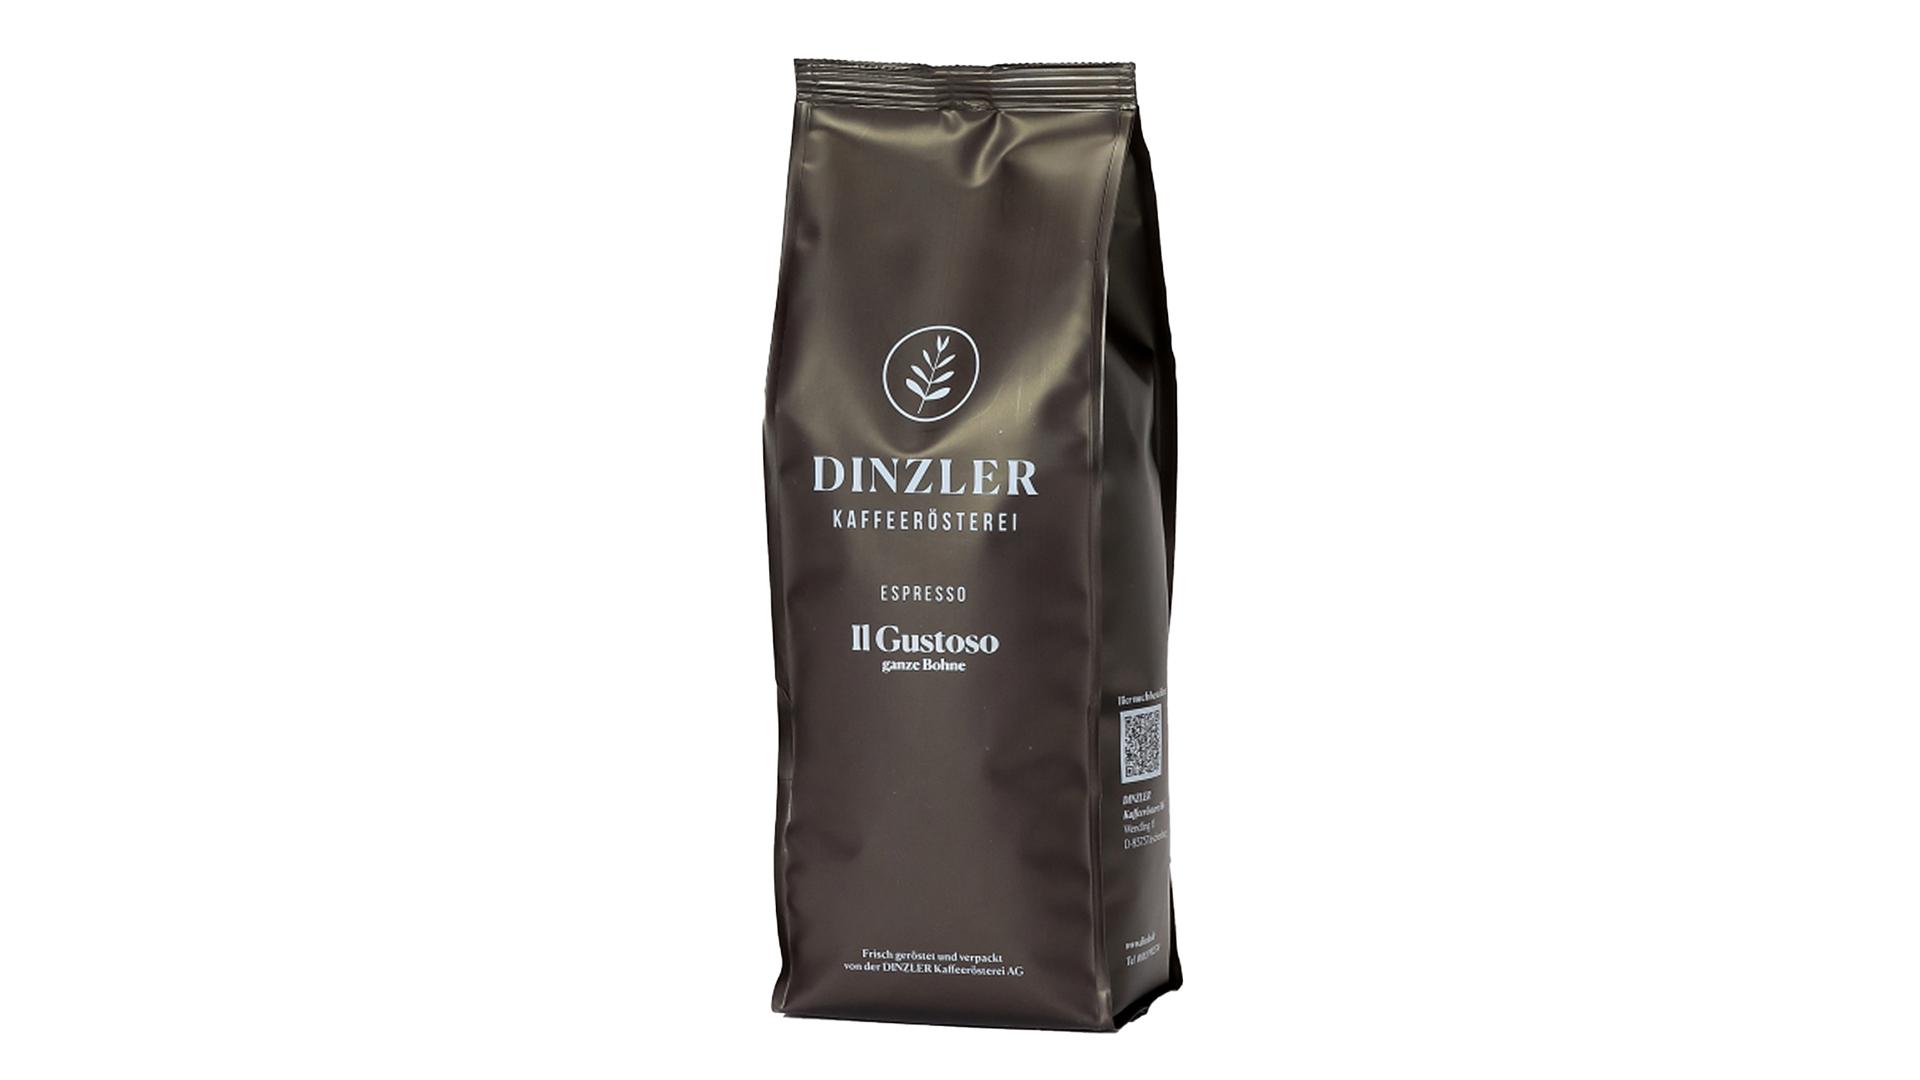 DINZLER Espresso IL Gustoso (ganze Bohne) - 1.000g Beutel